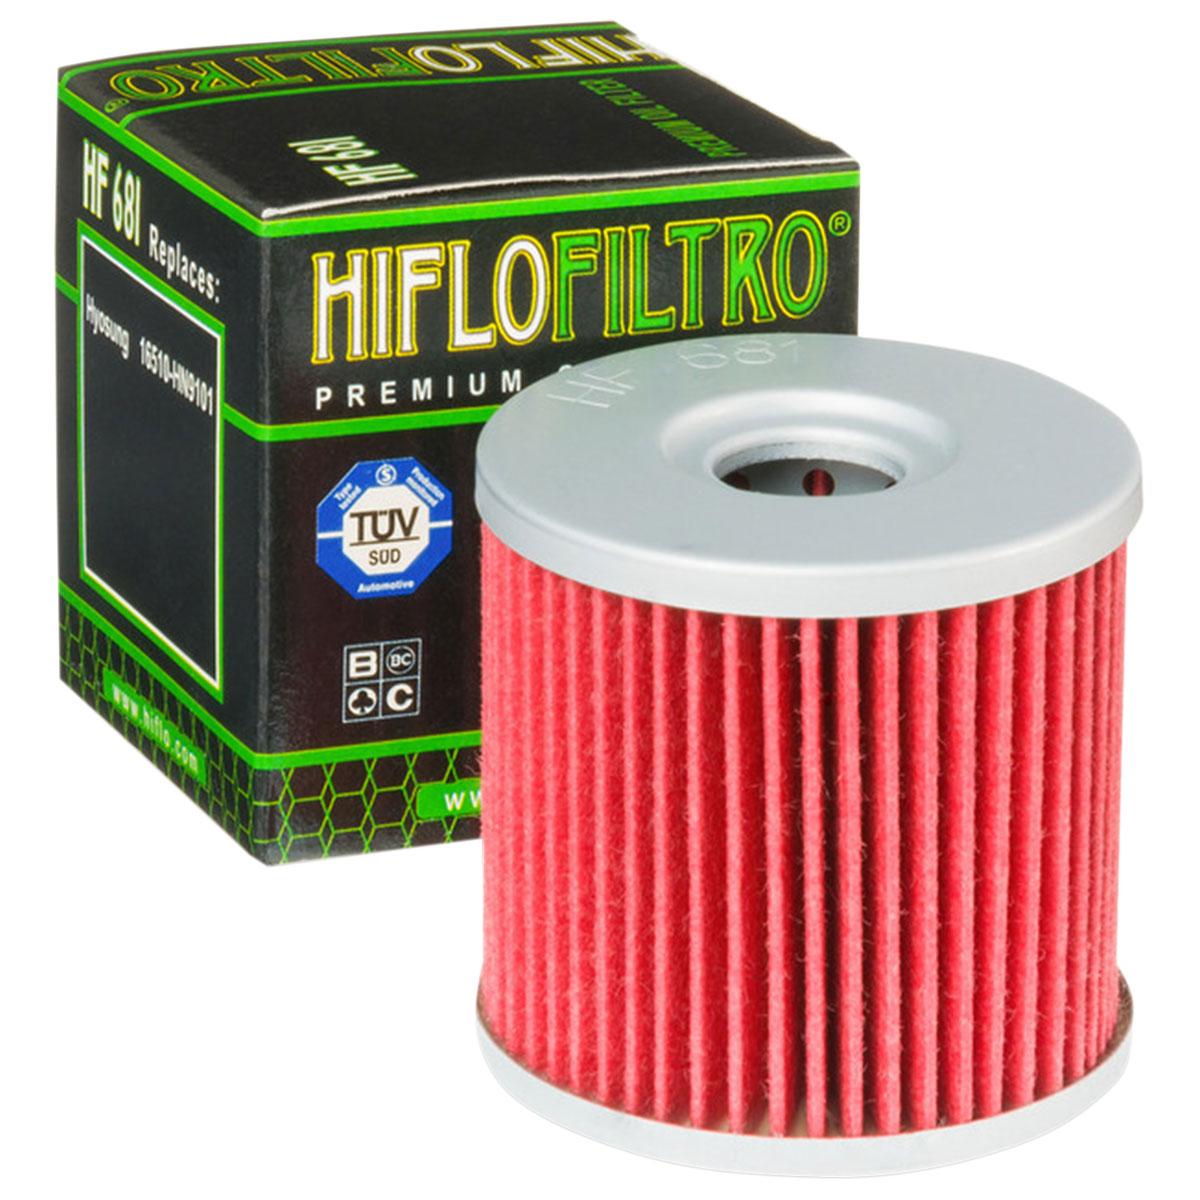 HIFLOFILTRO Oil Filter Cartridge